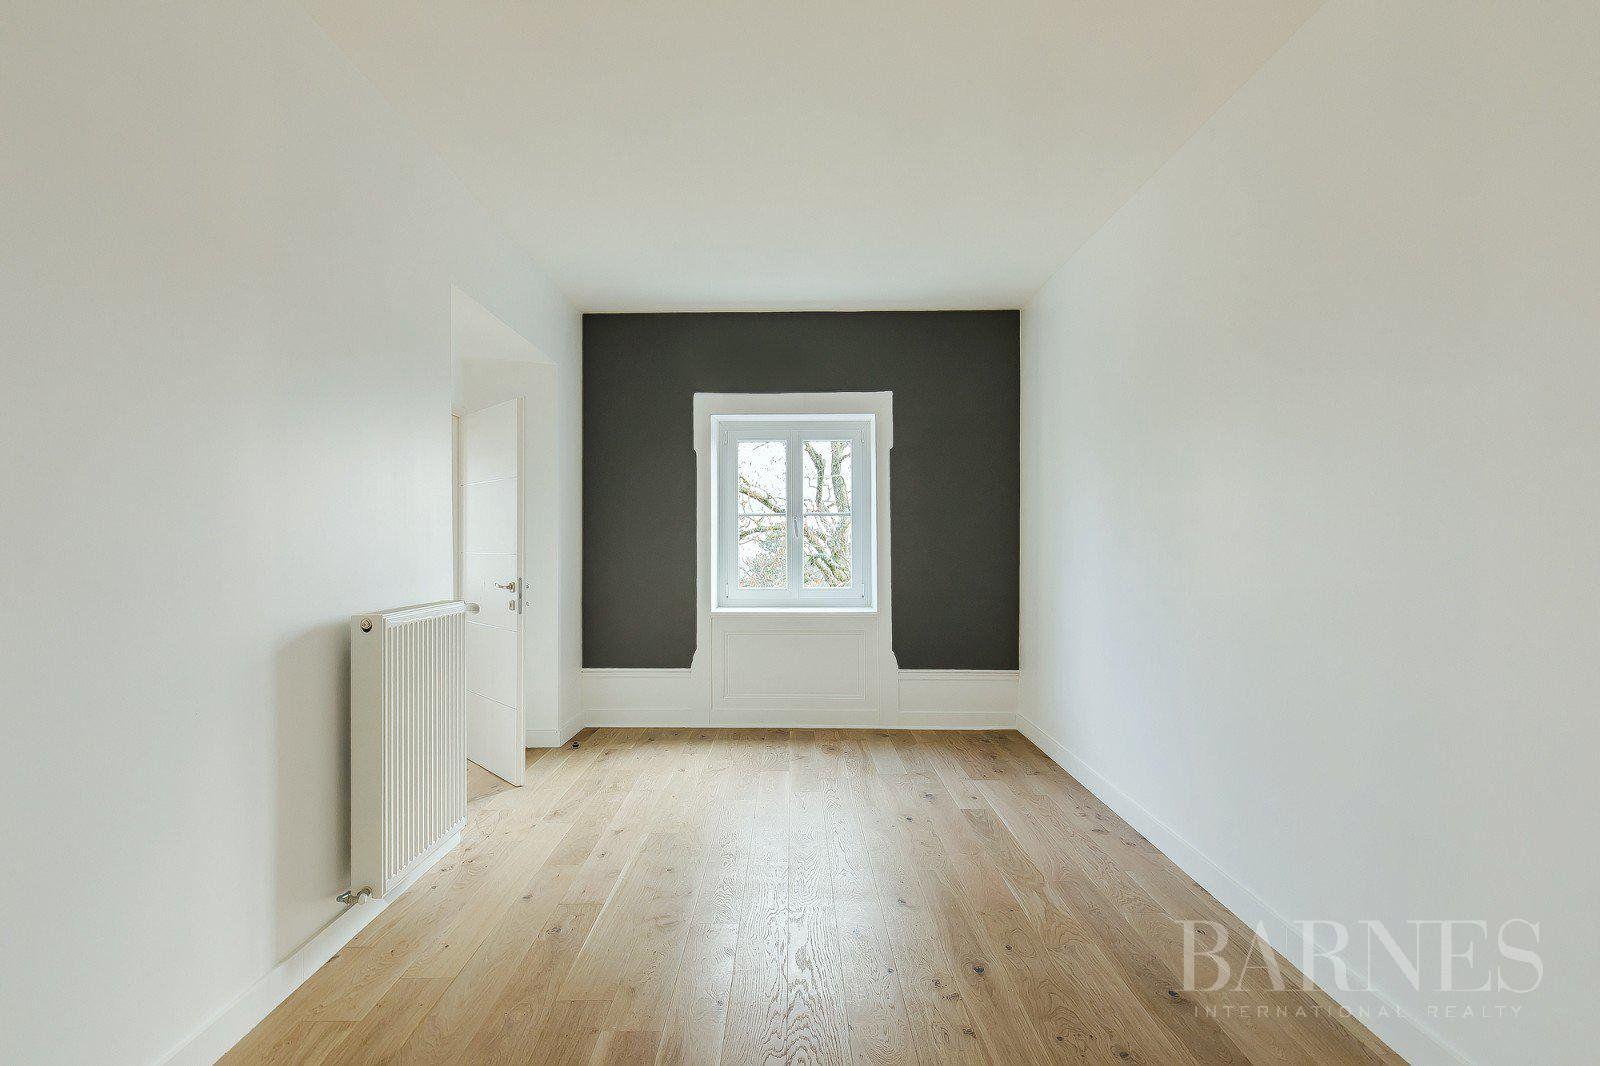 Saint-Genis-les-Ollières - Apartment of 91 sqm in a Manor - 3 bedrooms